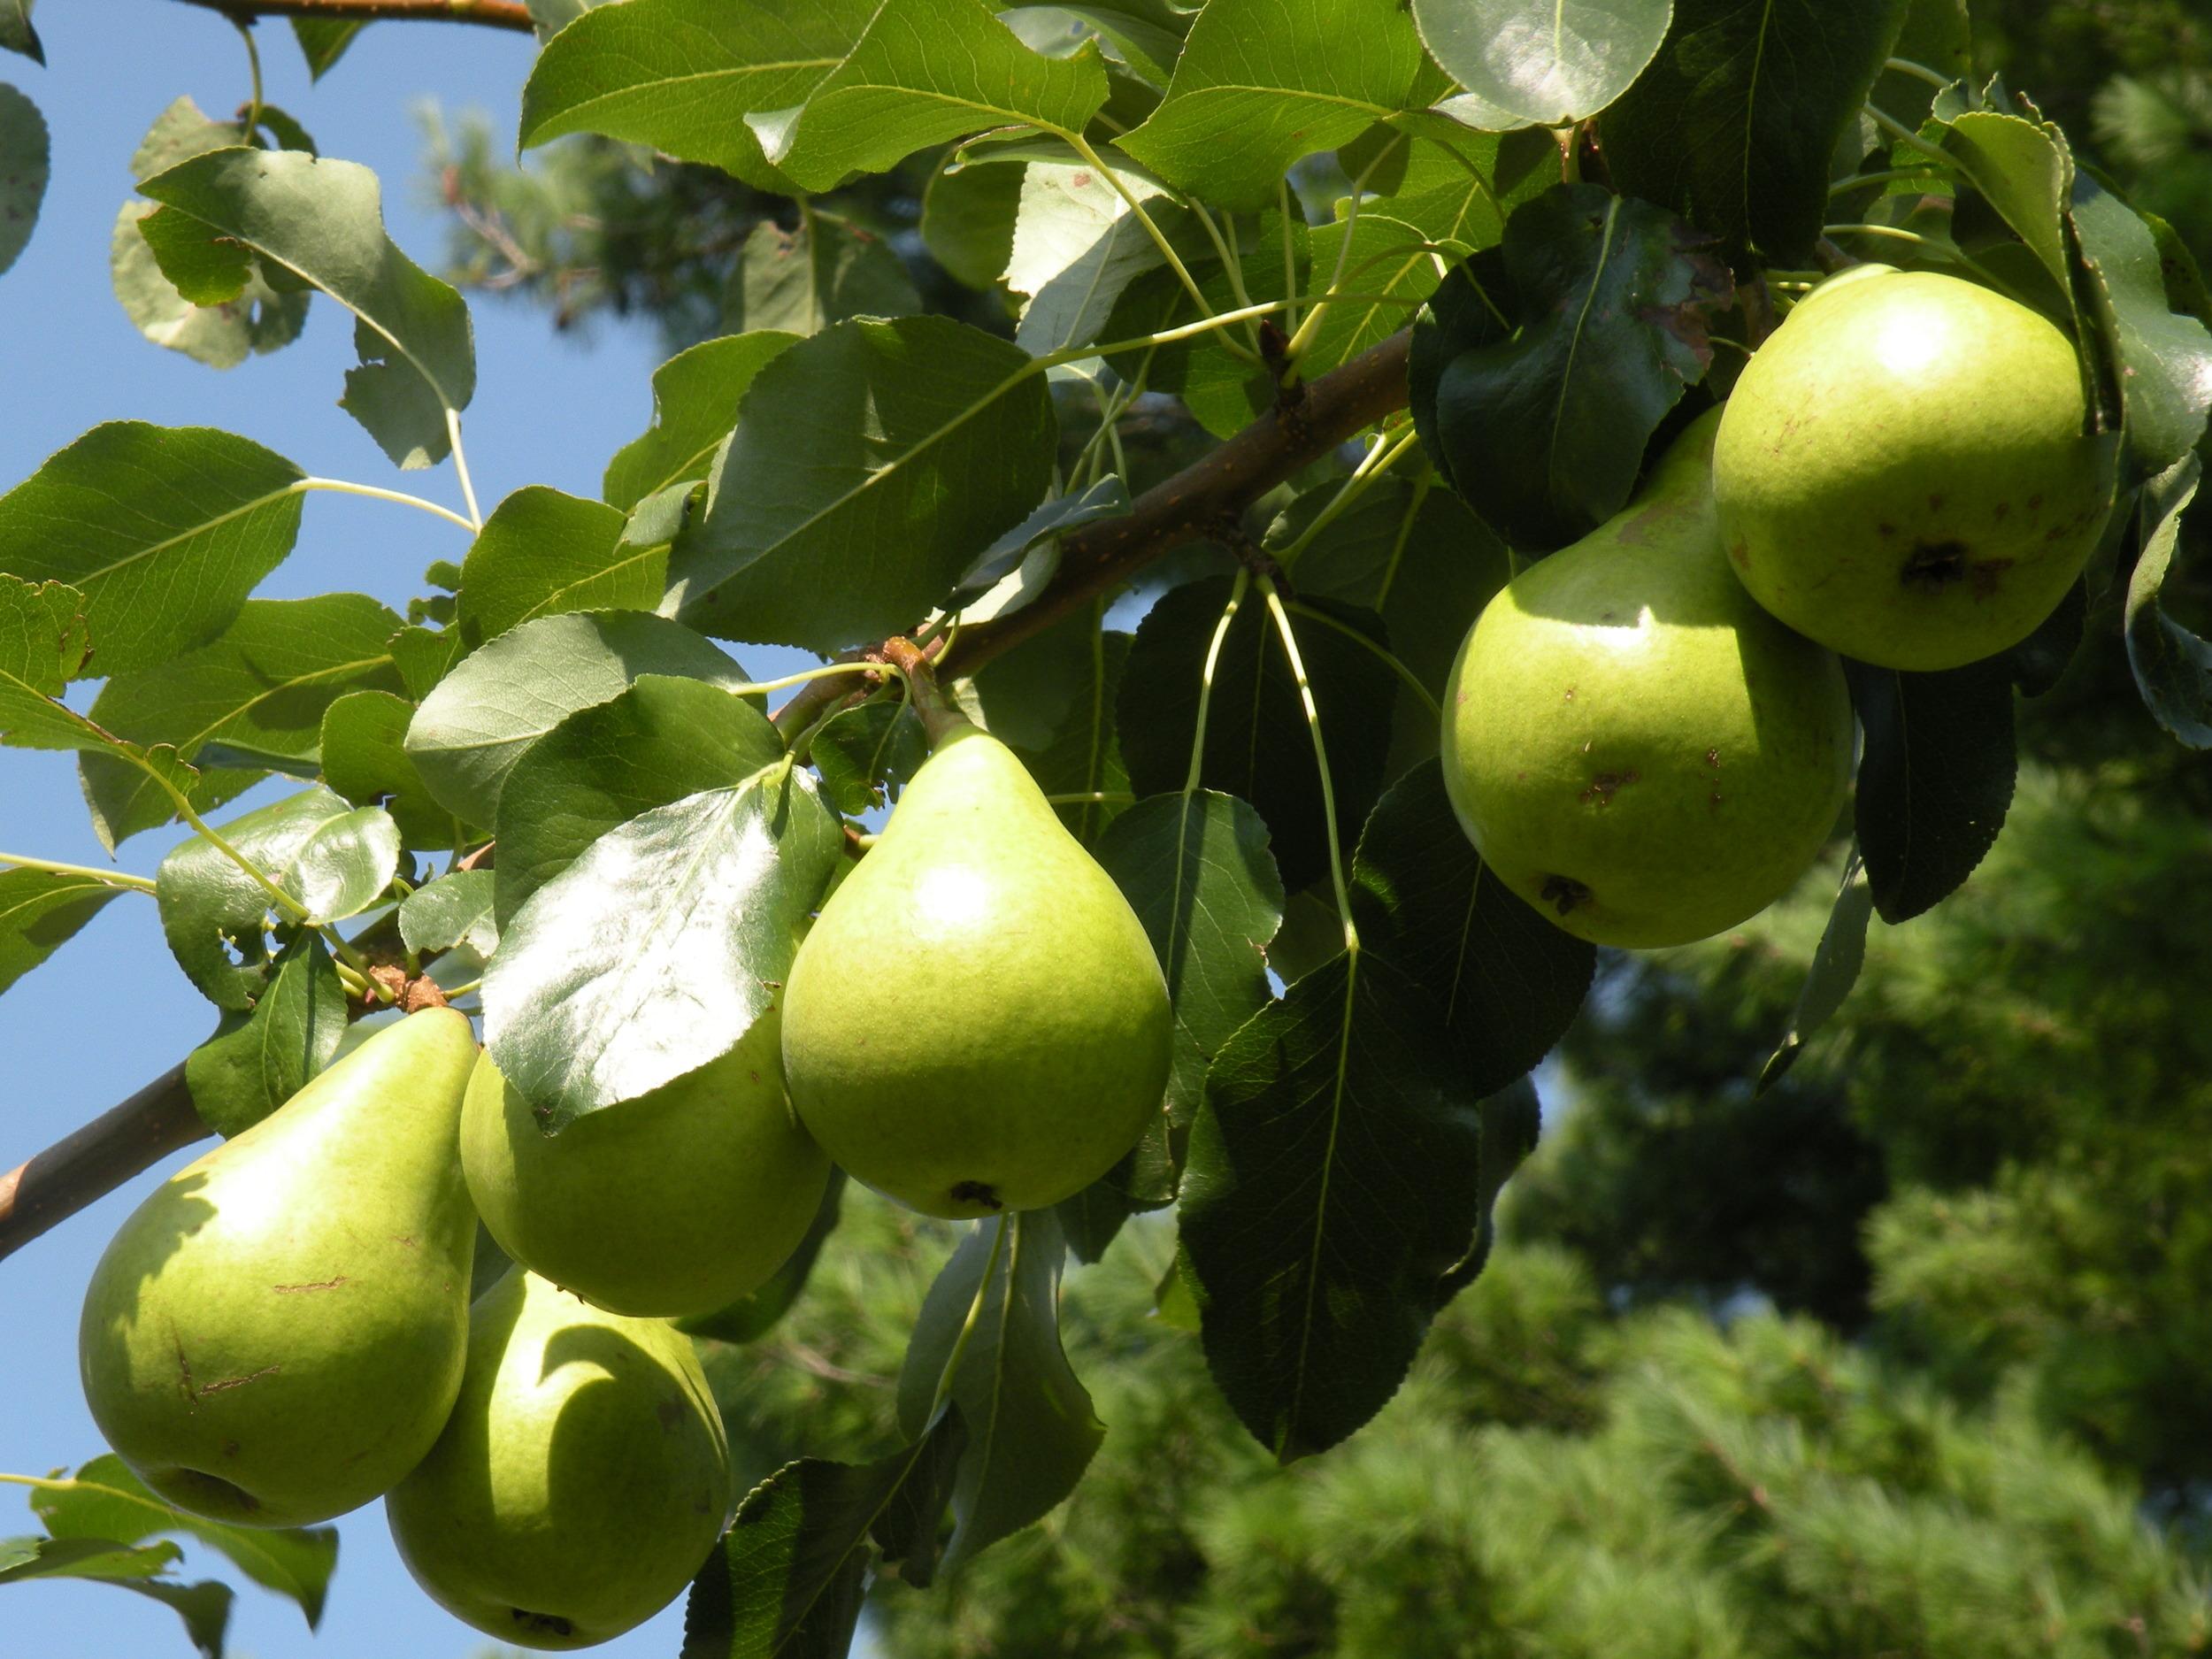 pears on a wire - beirschmidt 9 - 1 - 15.jpg